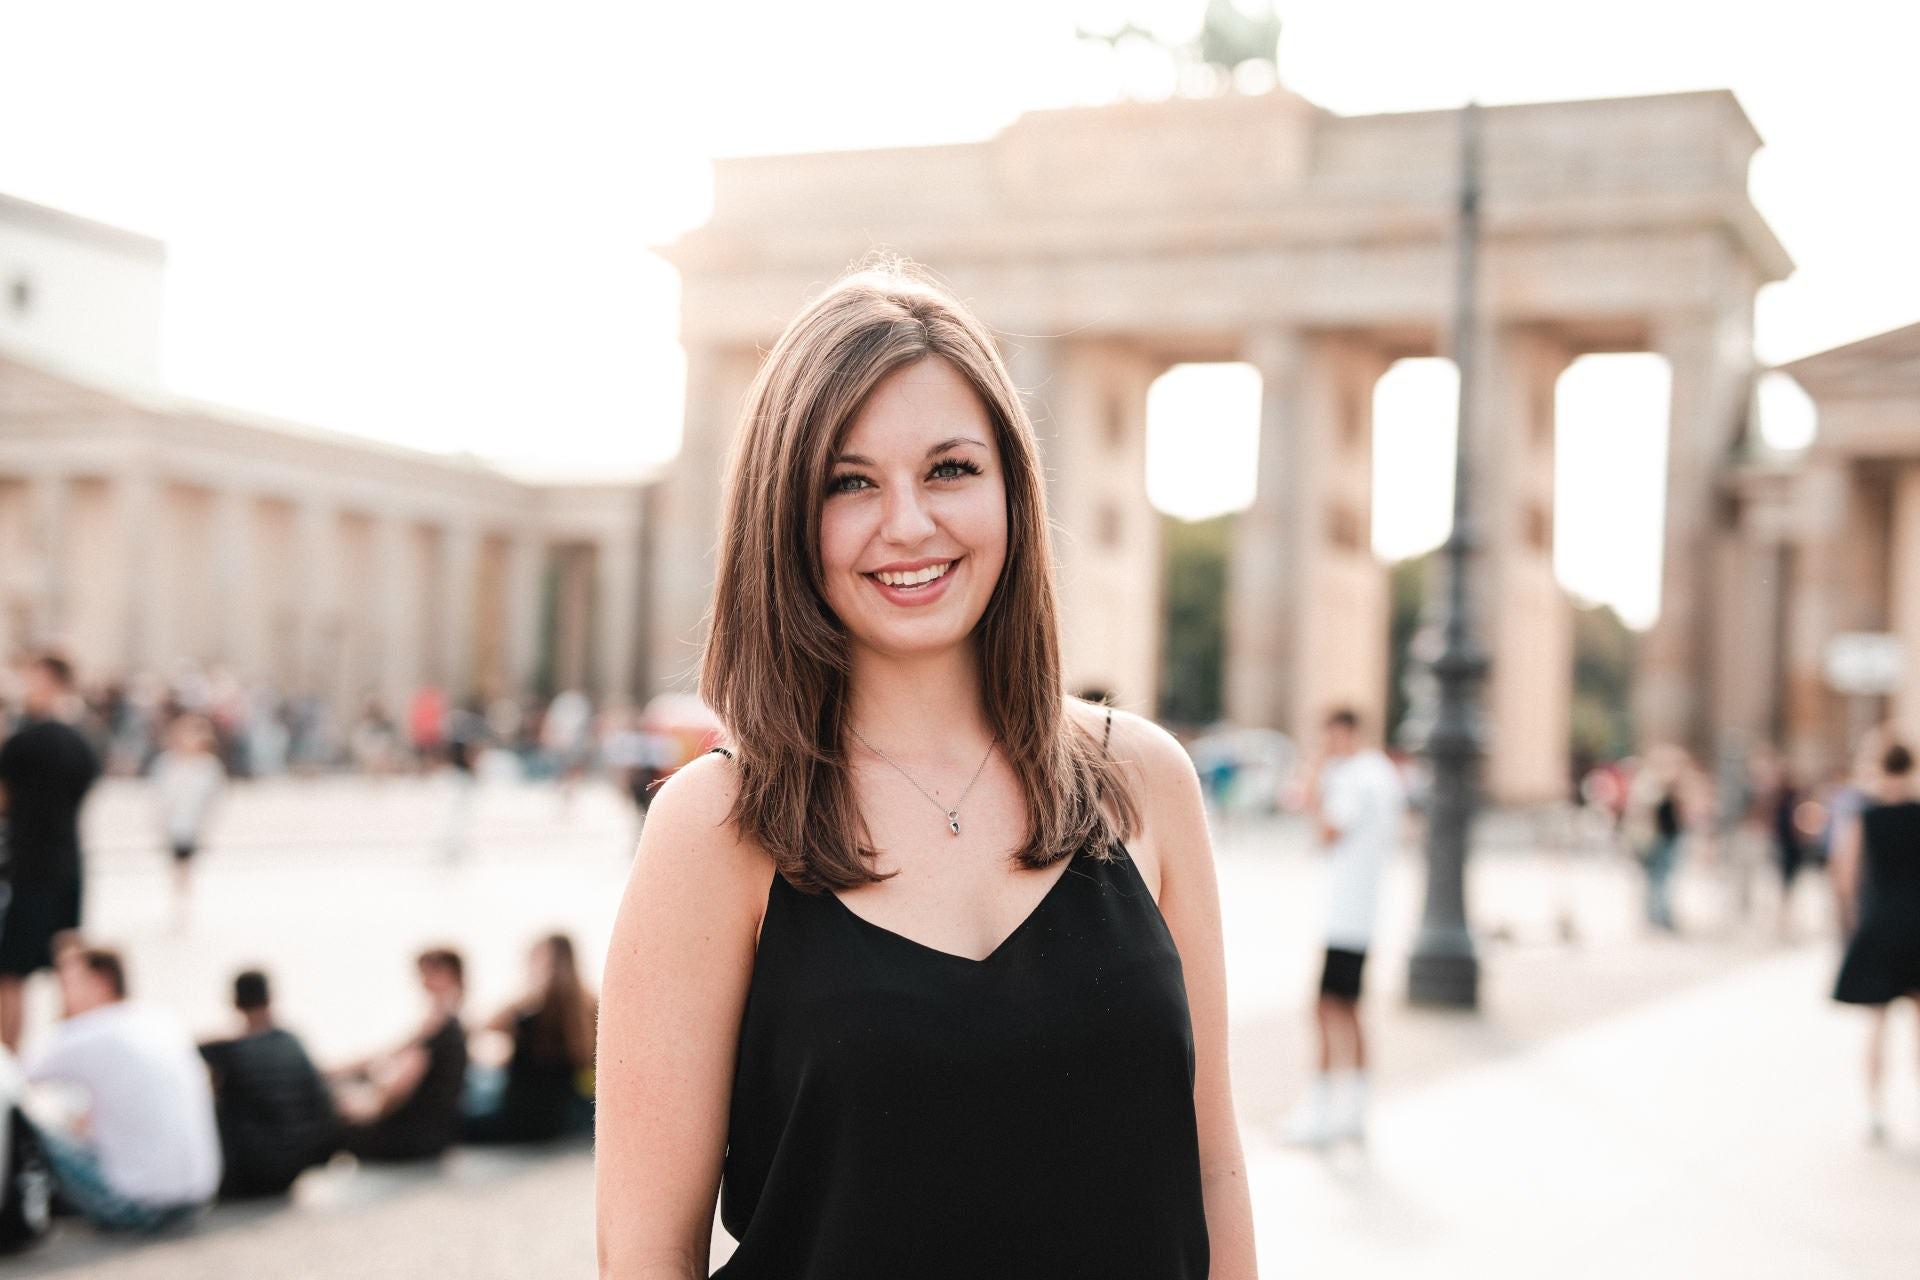 Als Krankenschwester in Berlin – arbeiten und leben in der Hauptstadt